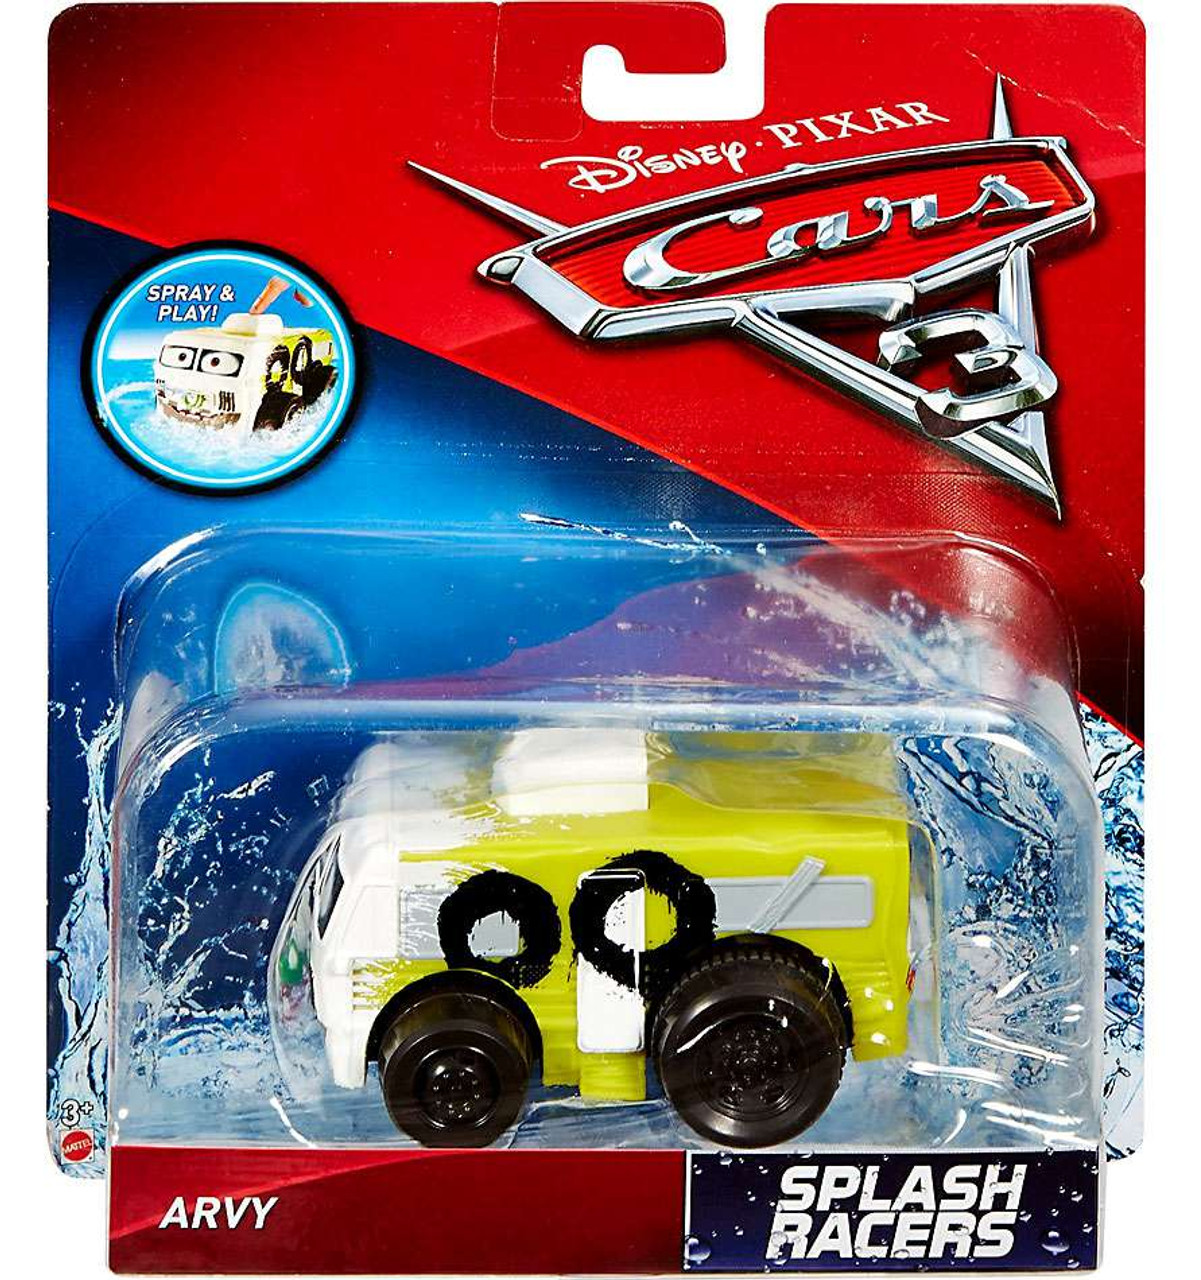 Disney Pixar Cars Cars 3 Splash Racers Oversized Arvy Bath Splashers